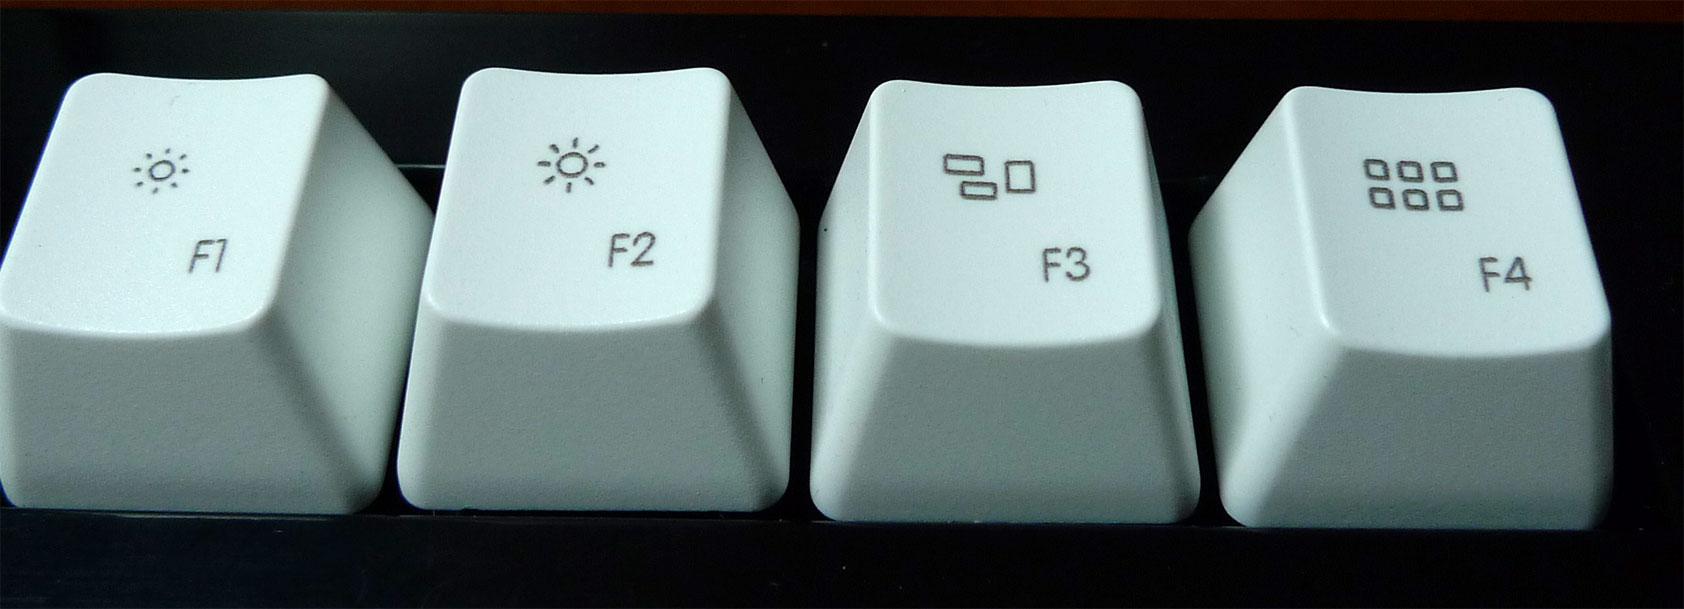 GitHub - ychw/CustomMacKeycaps: Custom Mac keycap templates for